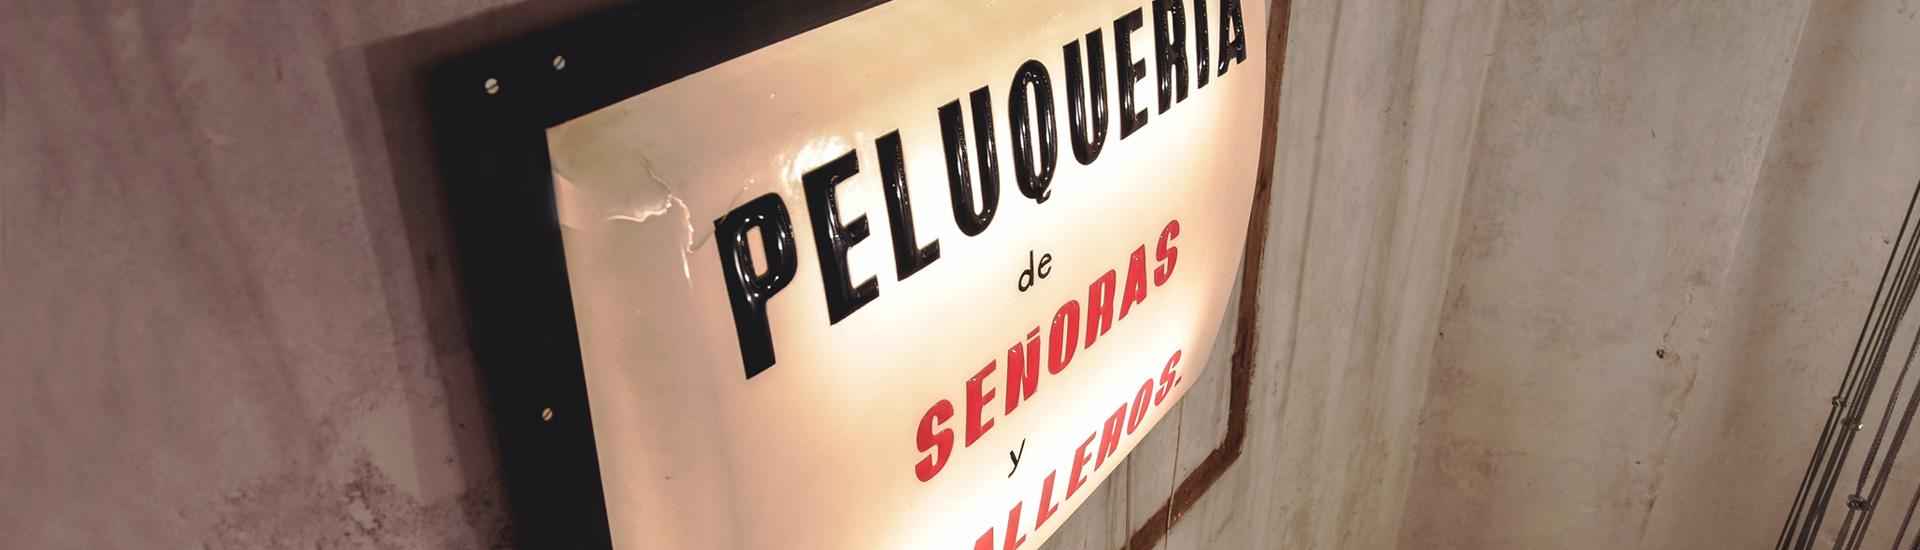 Perruqueria Camerinos by Ana Rubio, Barcelona